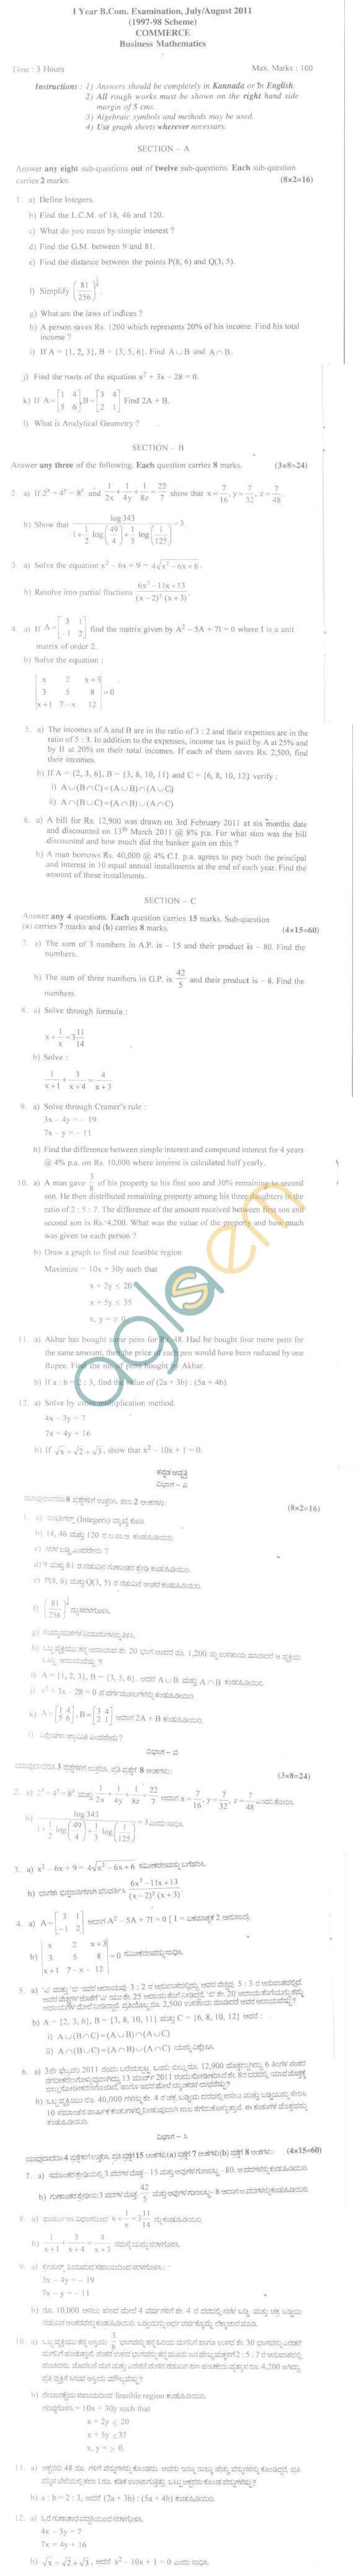 Bangalore University Question Paper July/August 2011 I Year B.Com. Examination - Commerce, Mathematics